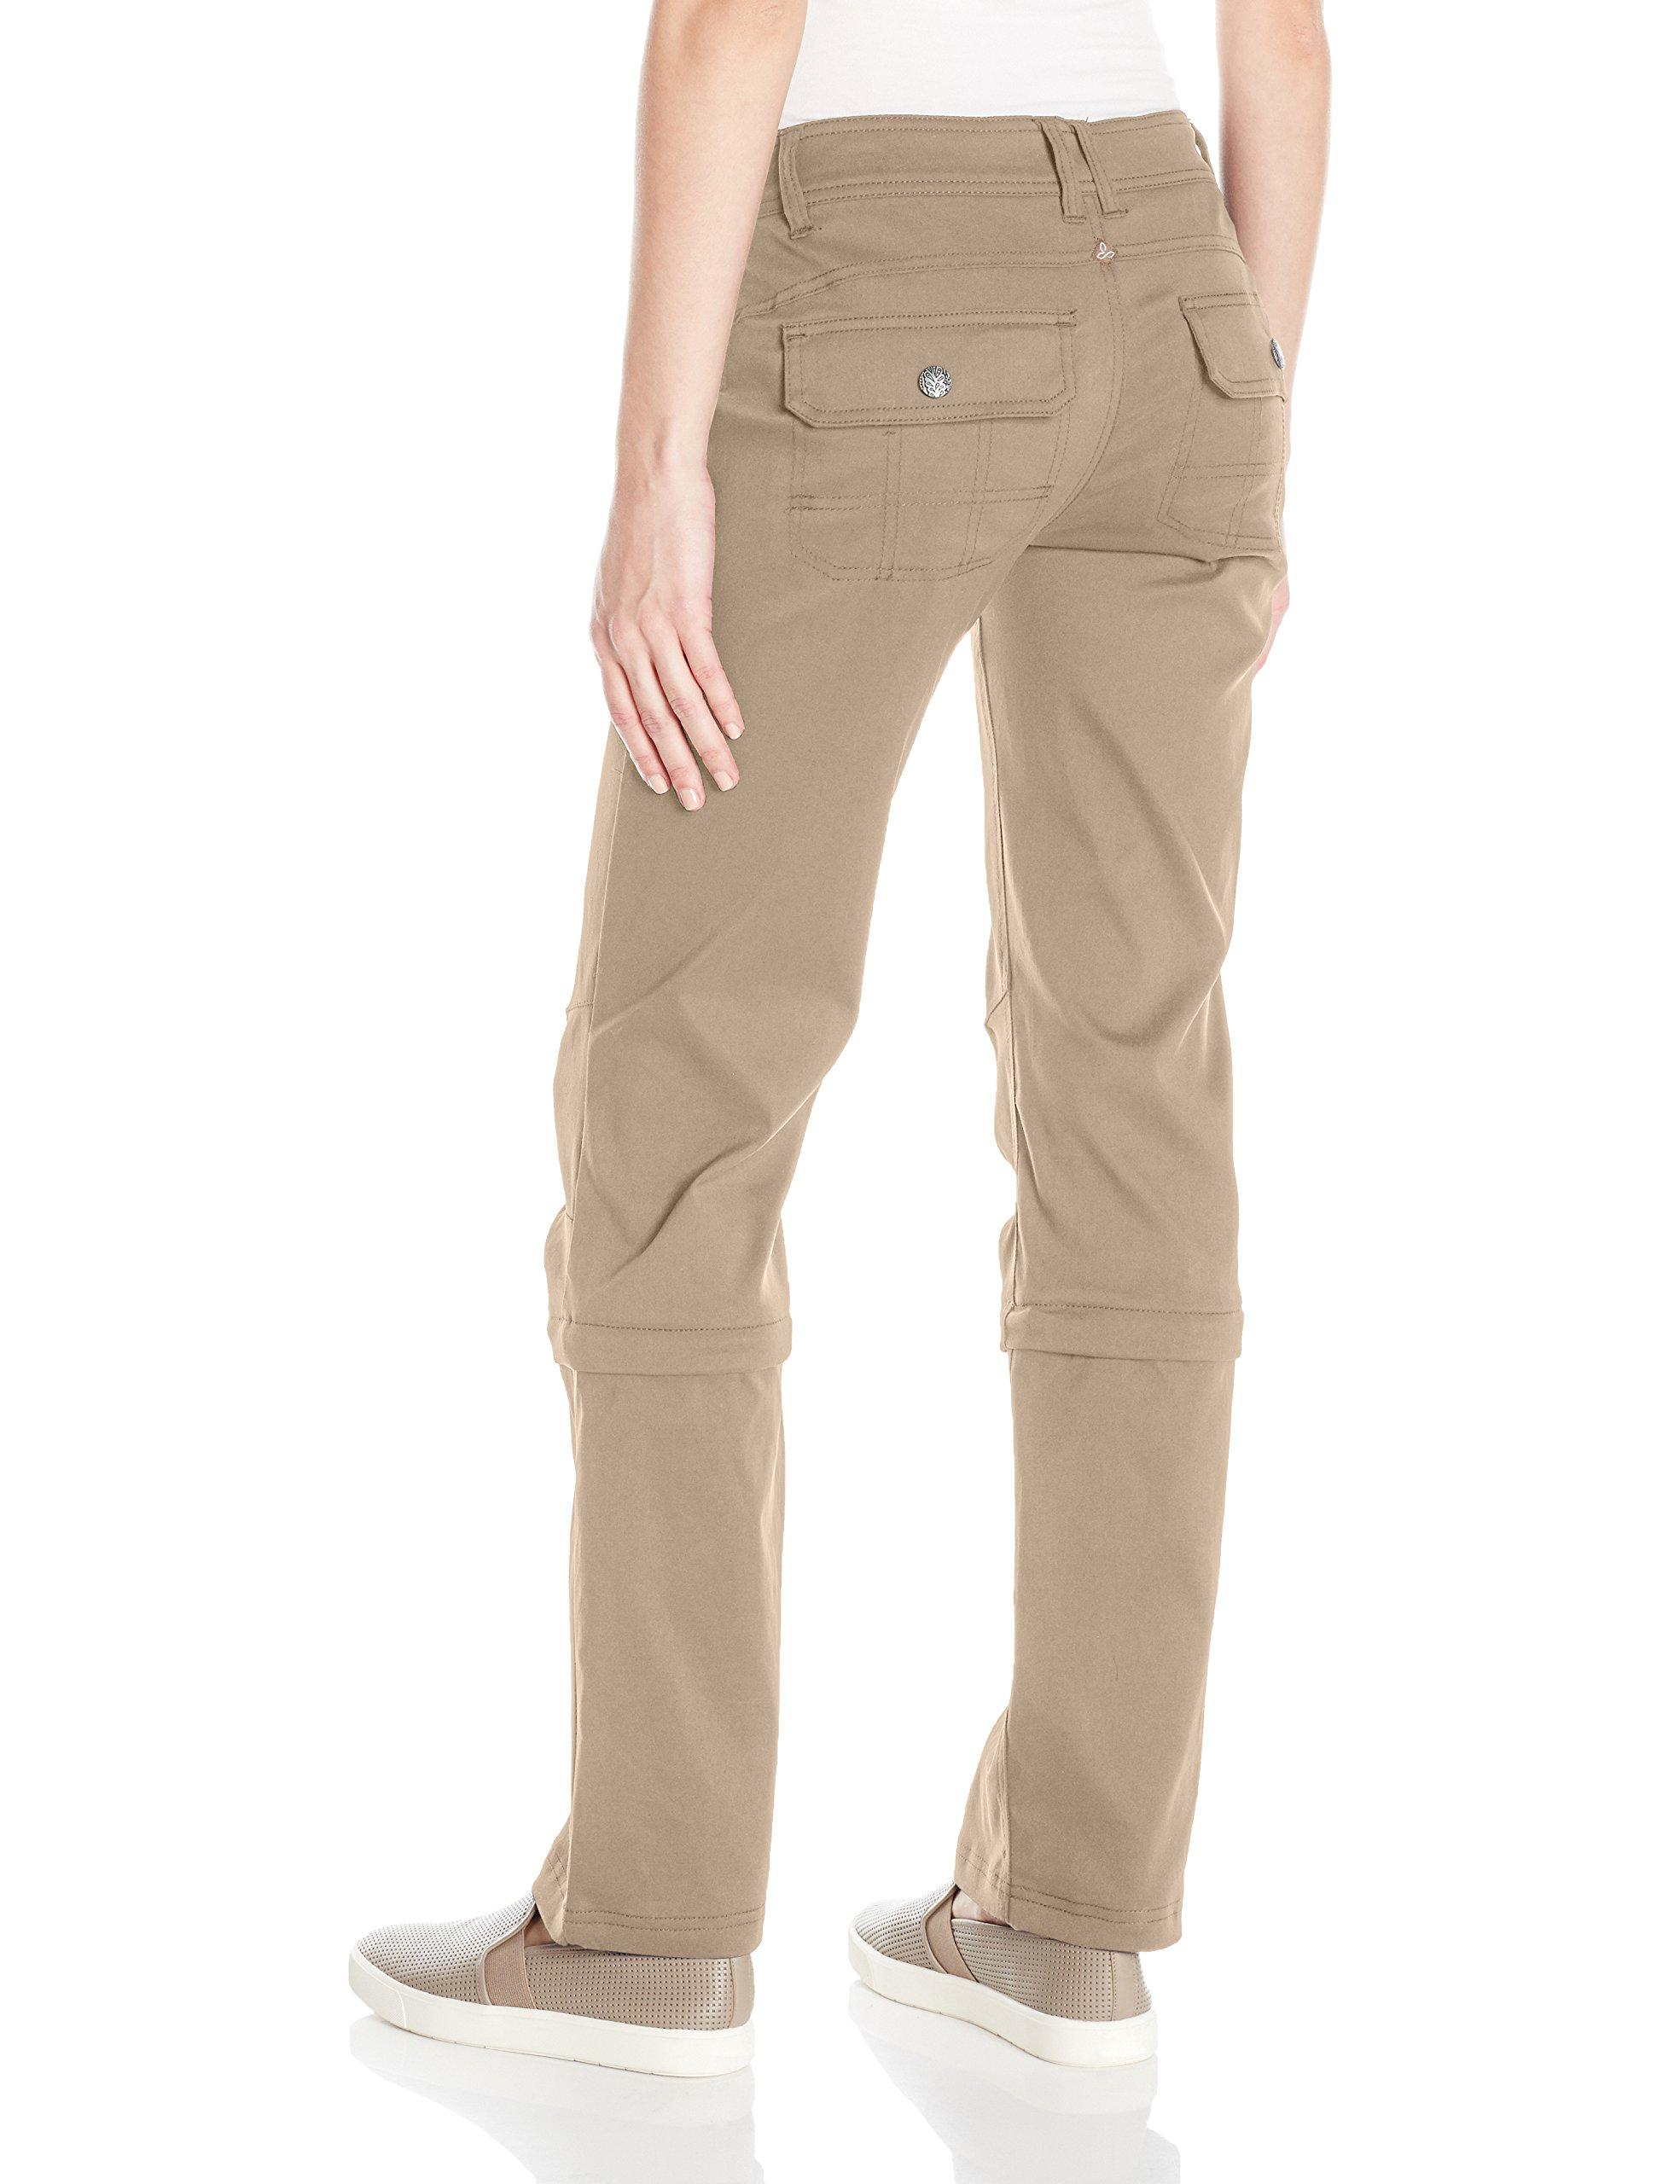 6efd9b8d2 Buyr.com - prAna Women's Halle Convertible Pant - Reg, Dark Khaki, 6